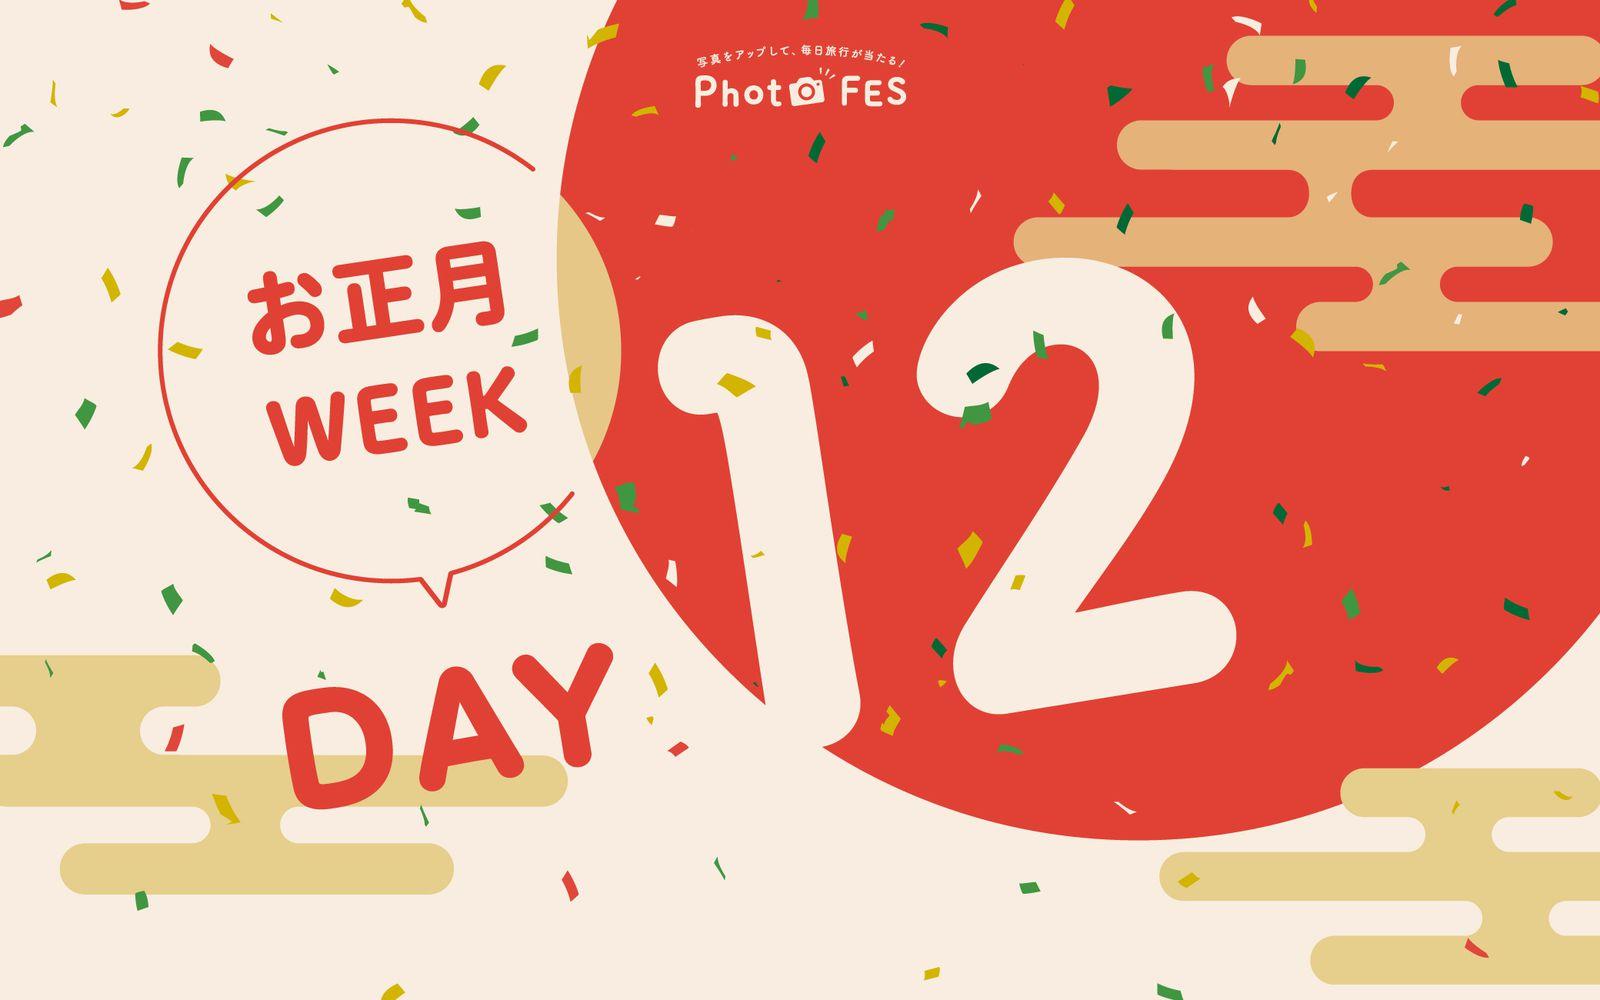 【DAY12】「Photo FES Winter 2019」1月12日投稿分であたる賞品&受賞者発表